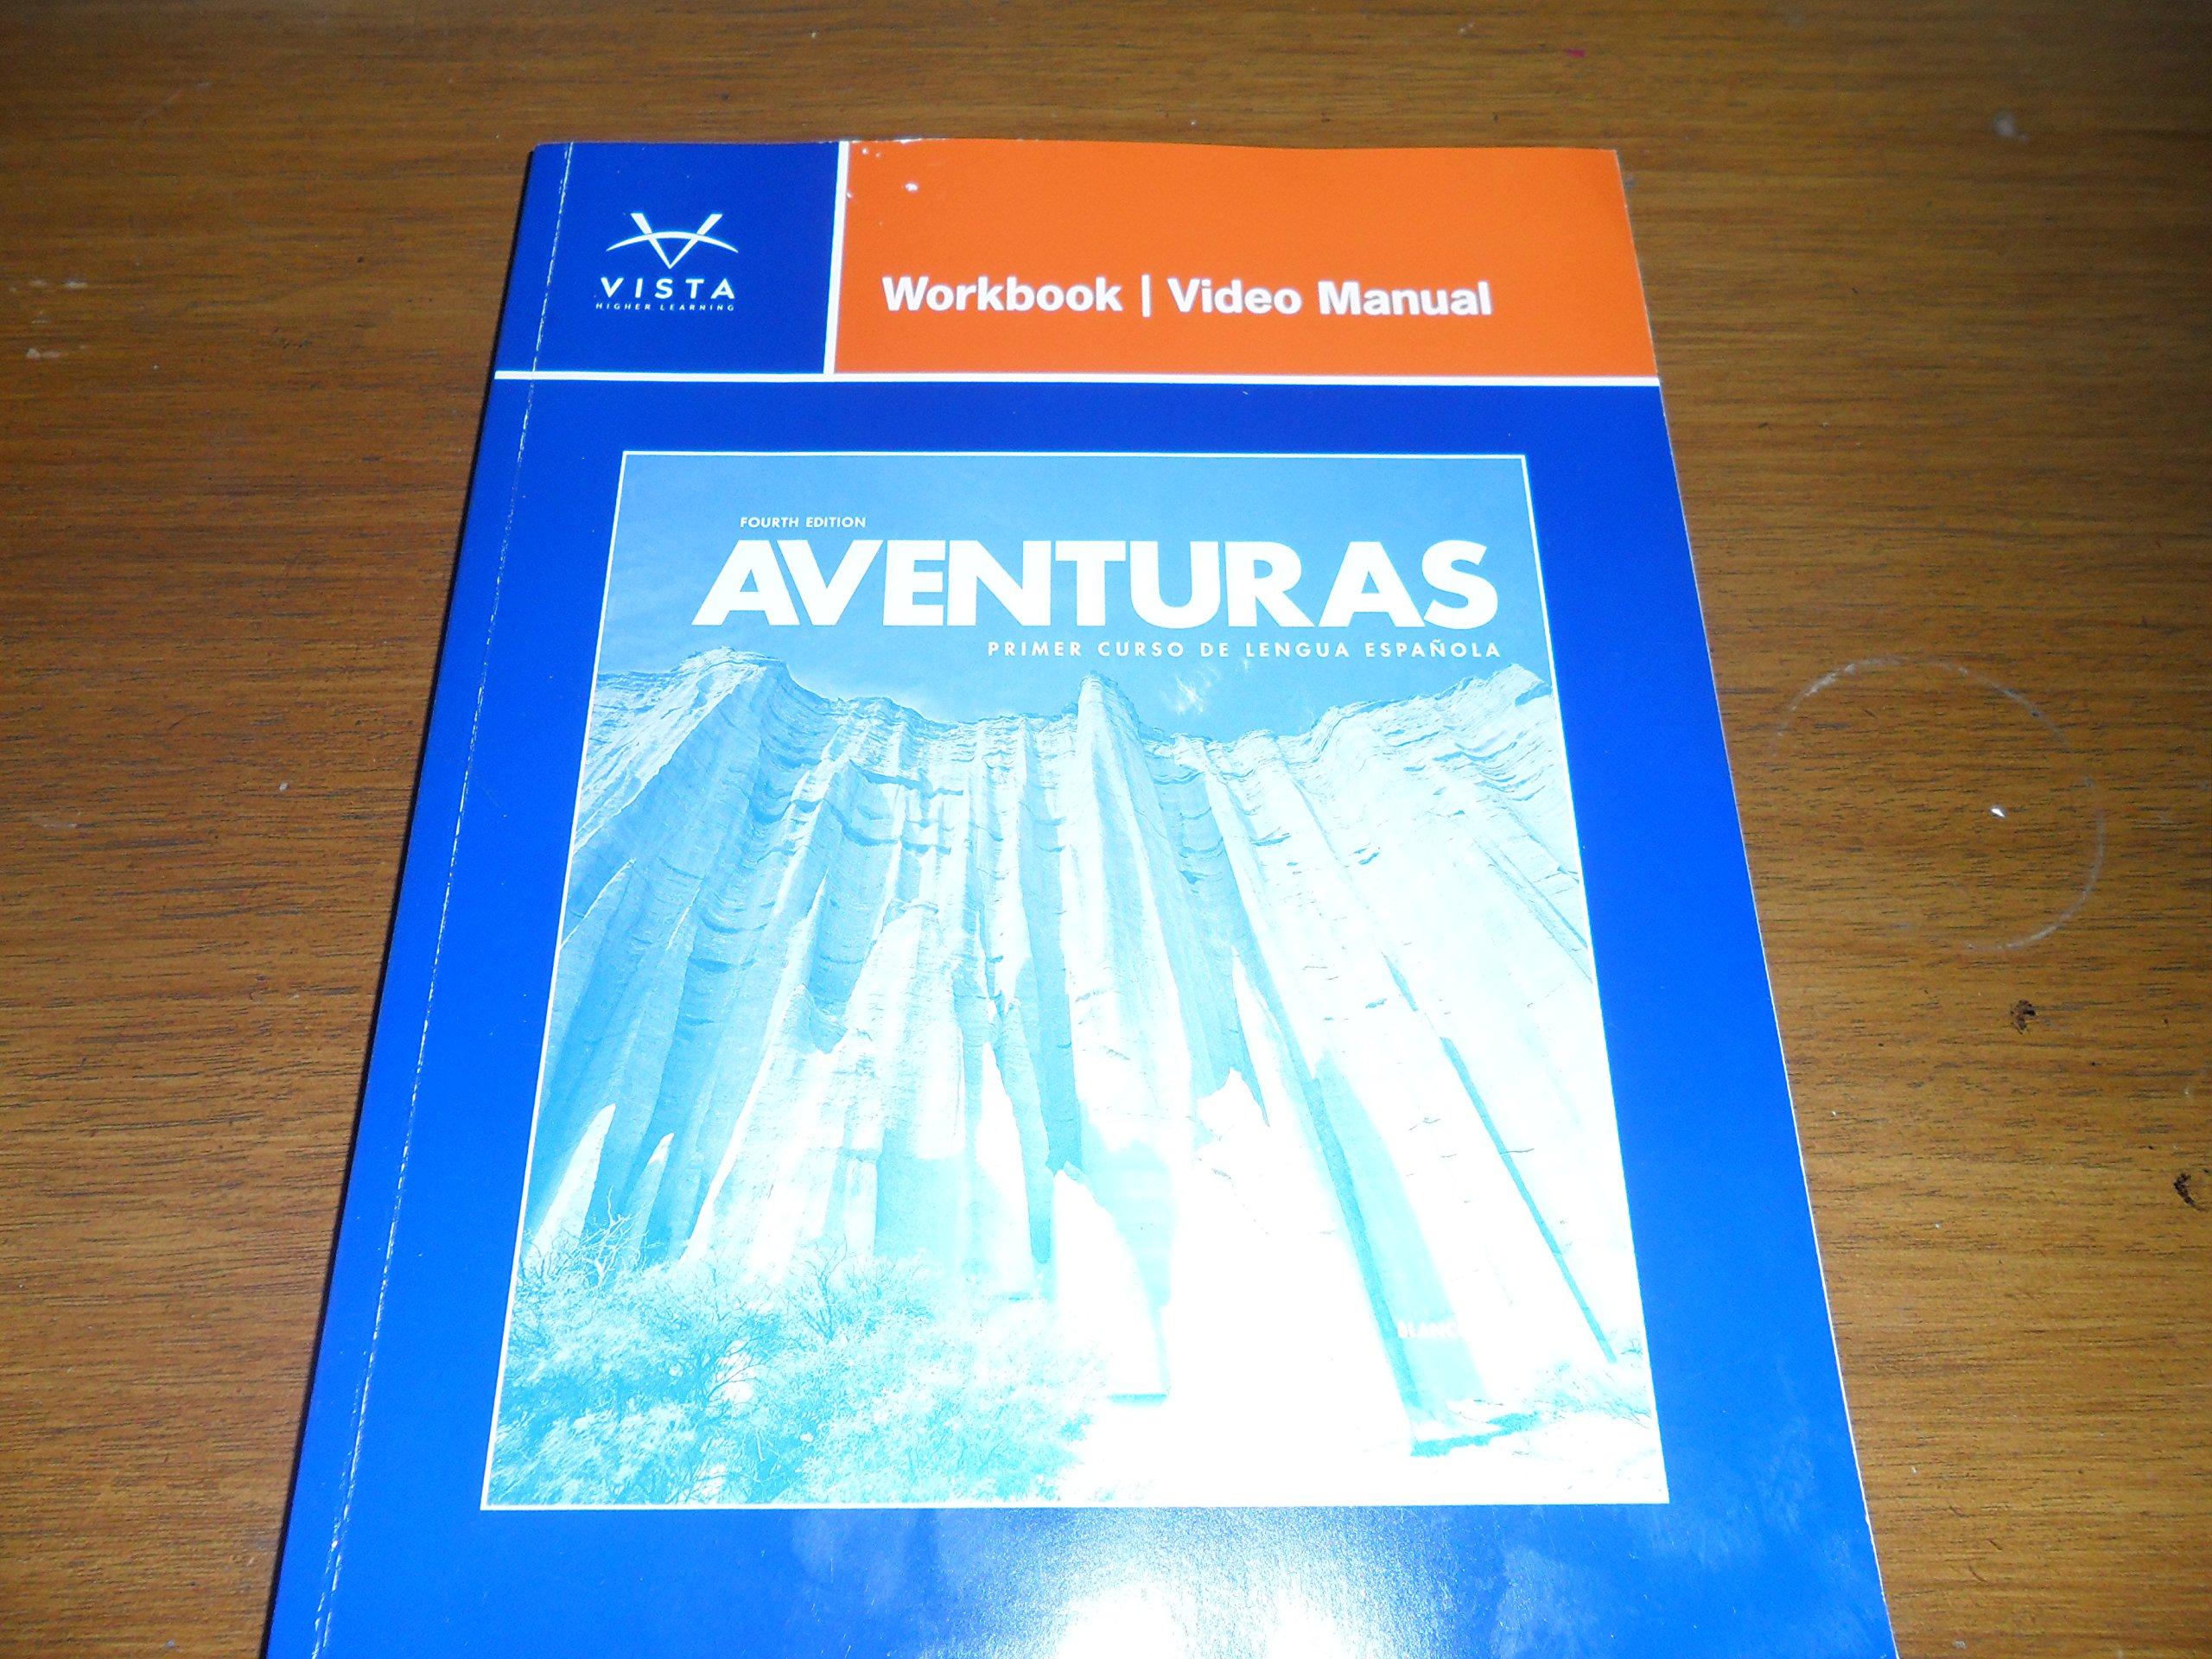 Aventuras workbookvideo manua vista higher learning 9781618570567 aventuras workbookvideo manua vista higher learning 9781618570567 amazon books fandeluxe Gallery